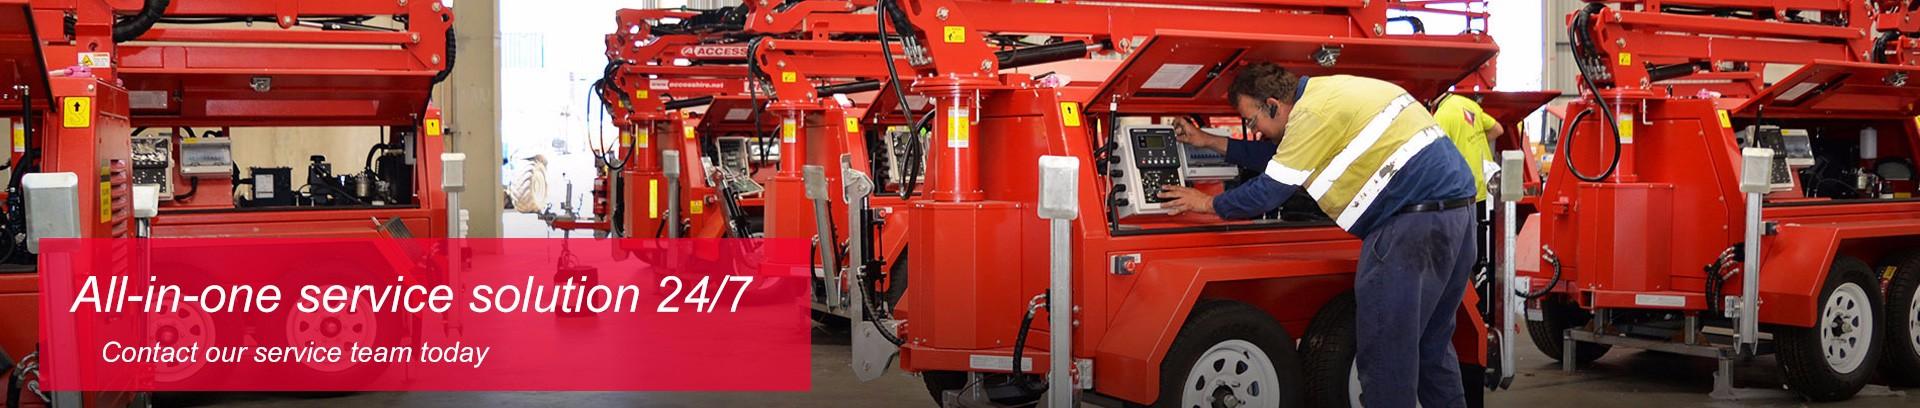 02-generators-australia-image-hire